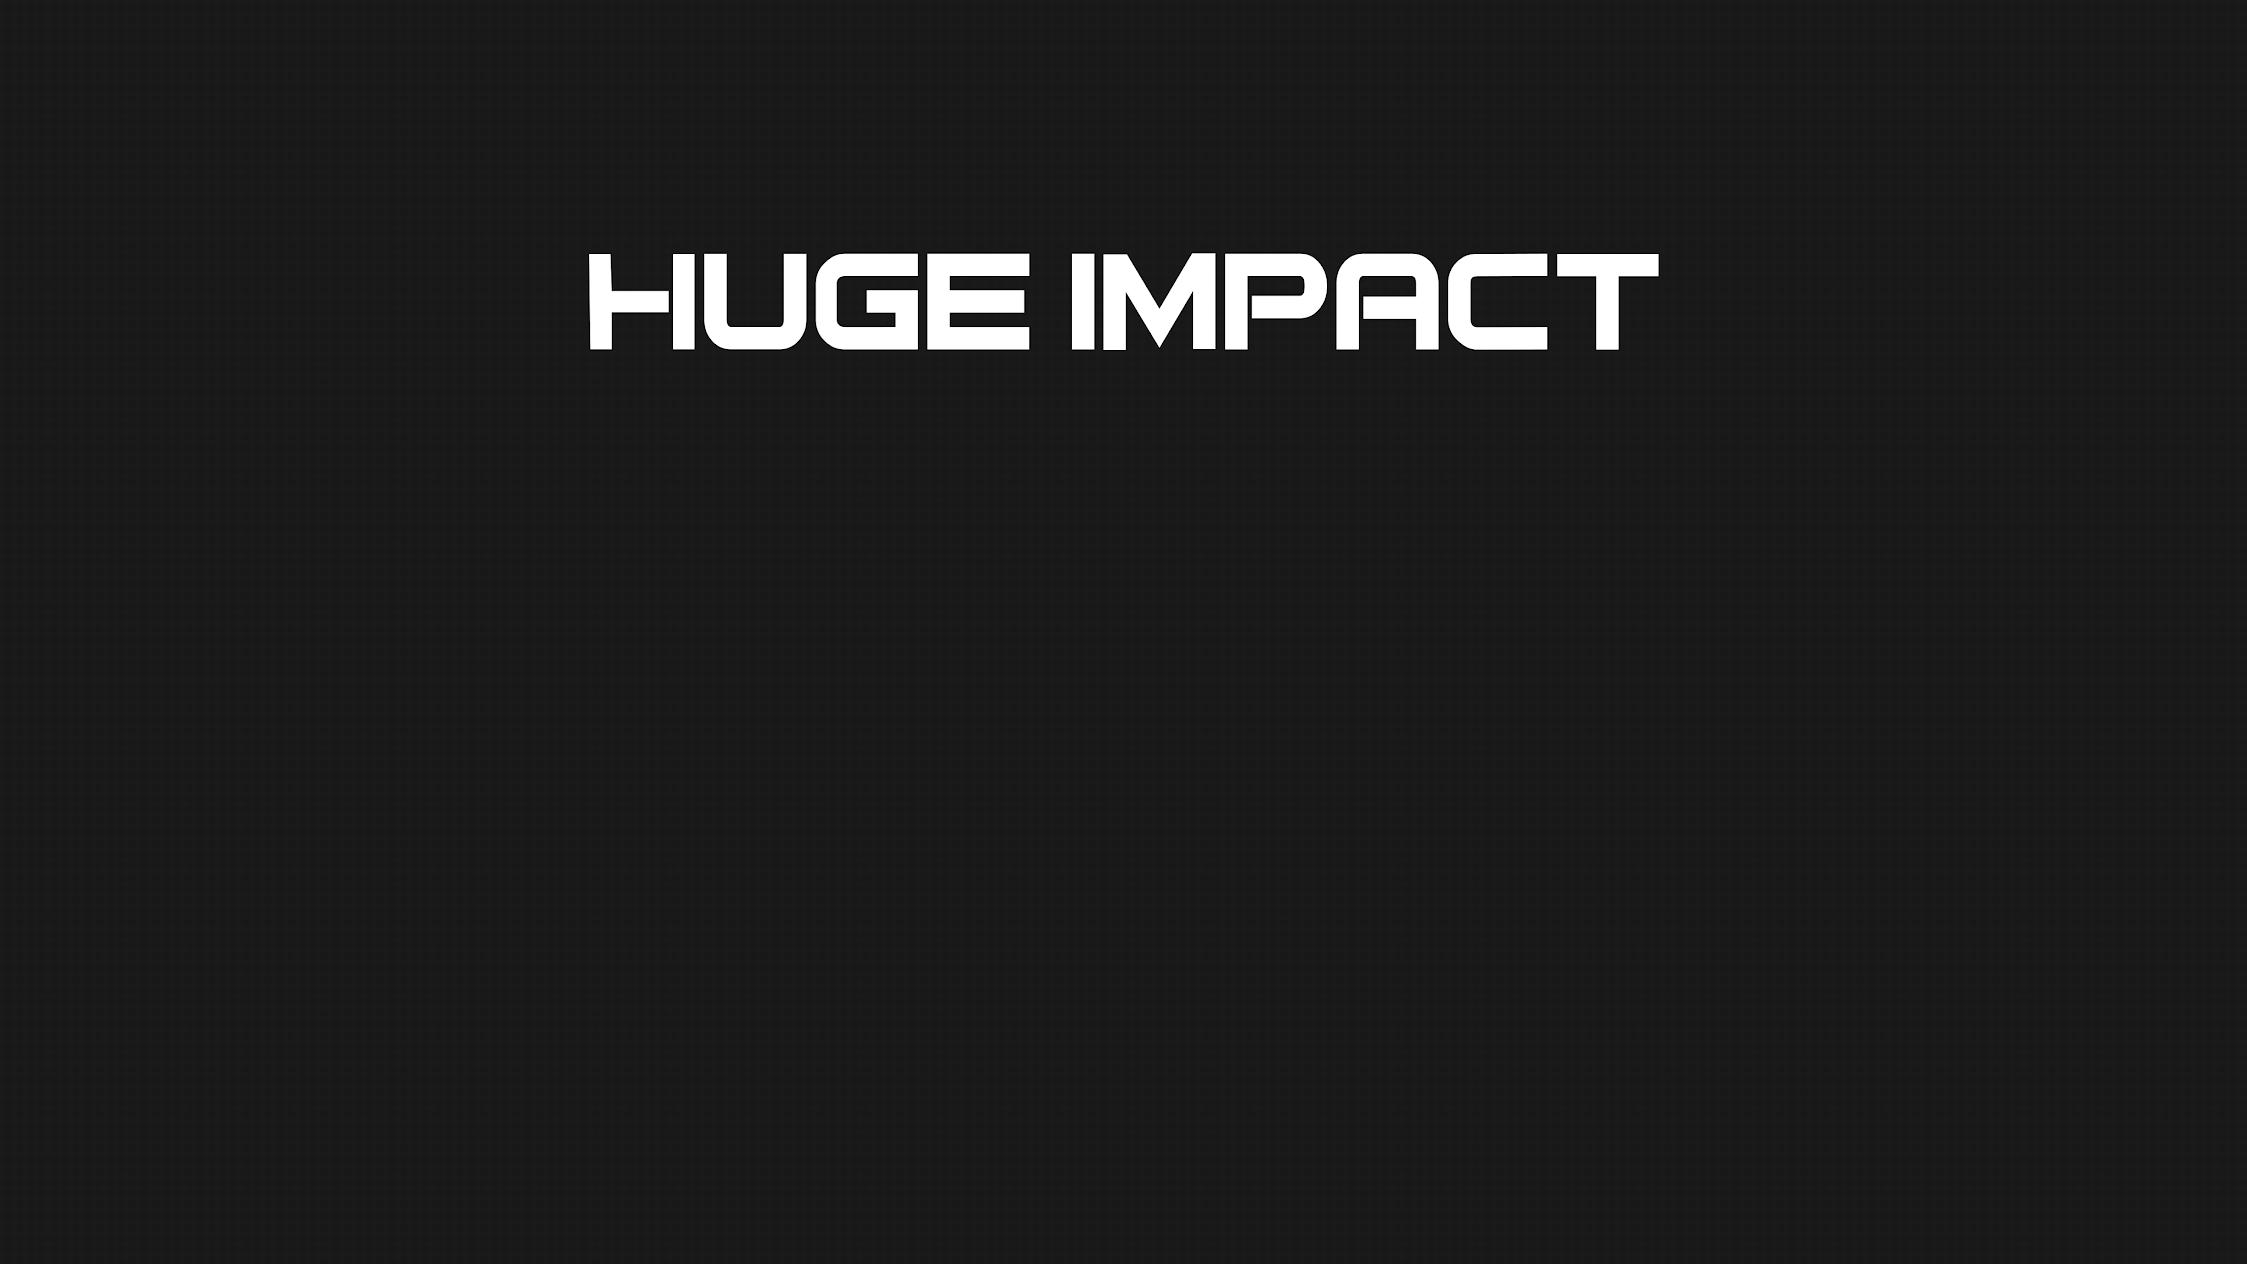 Huge Impact